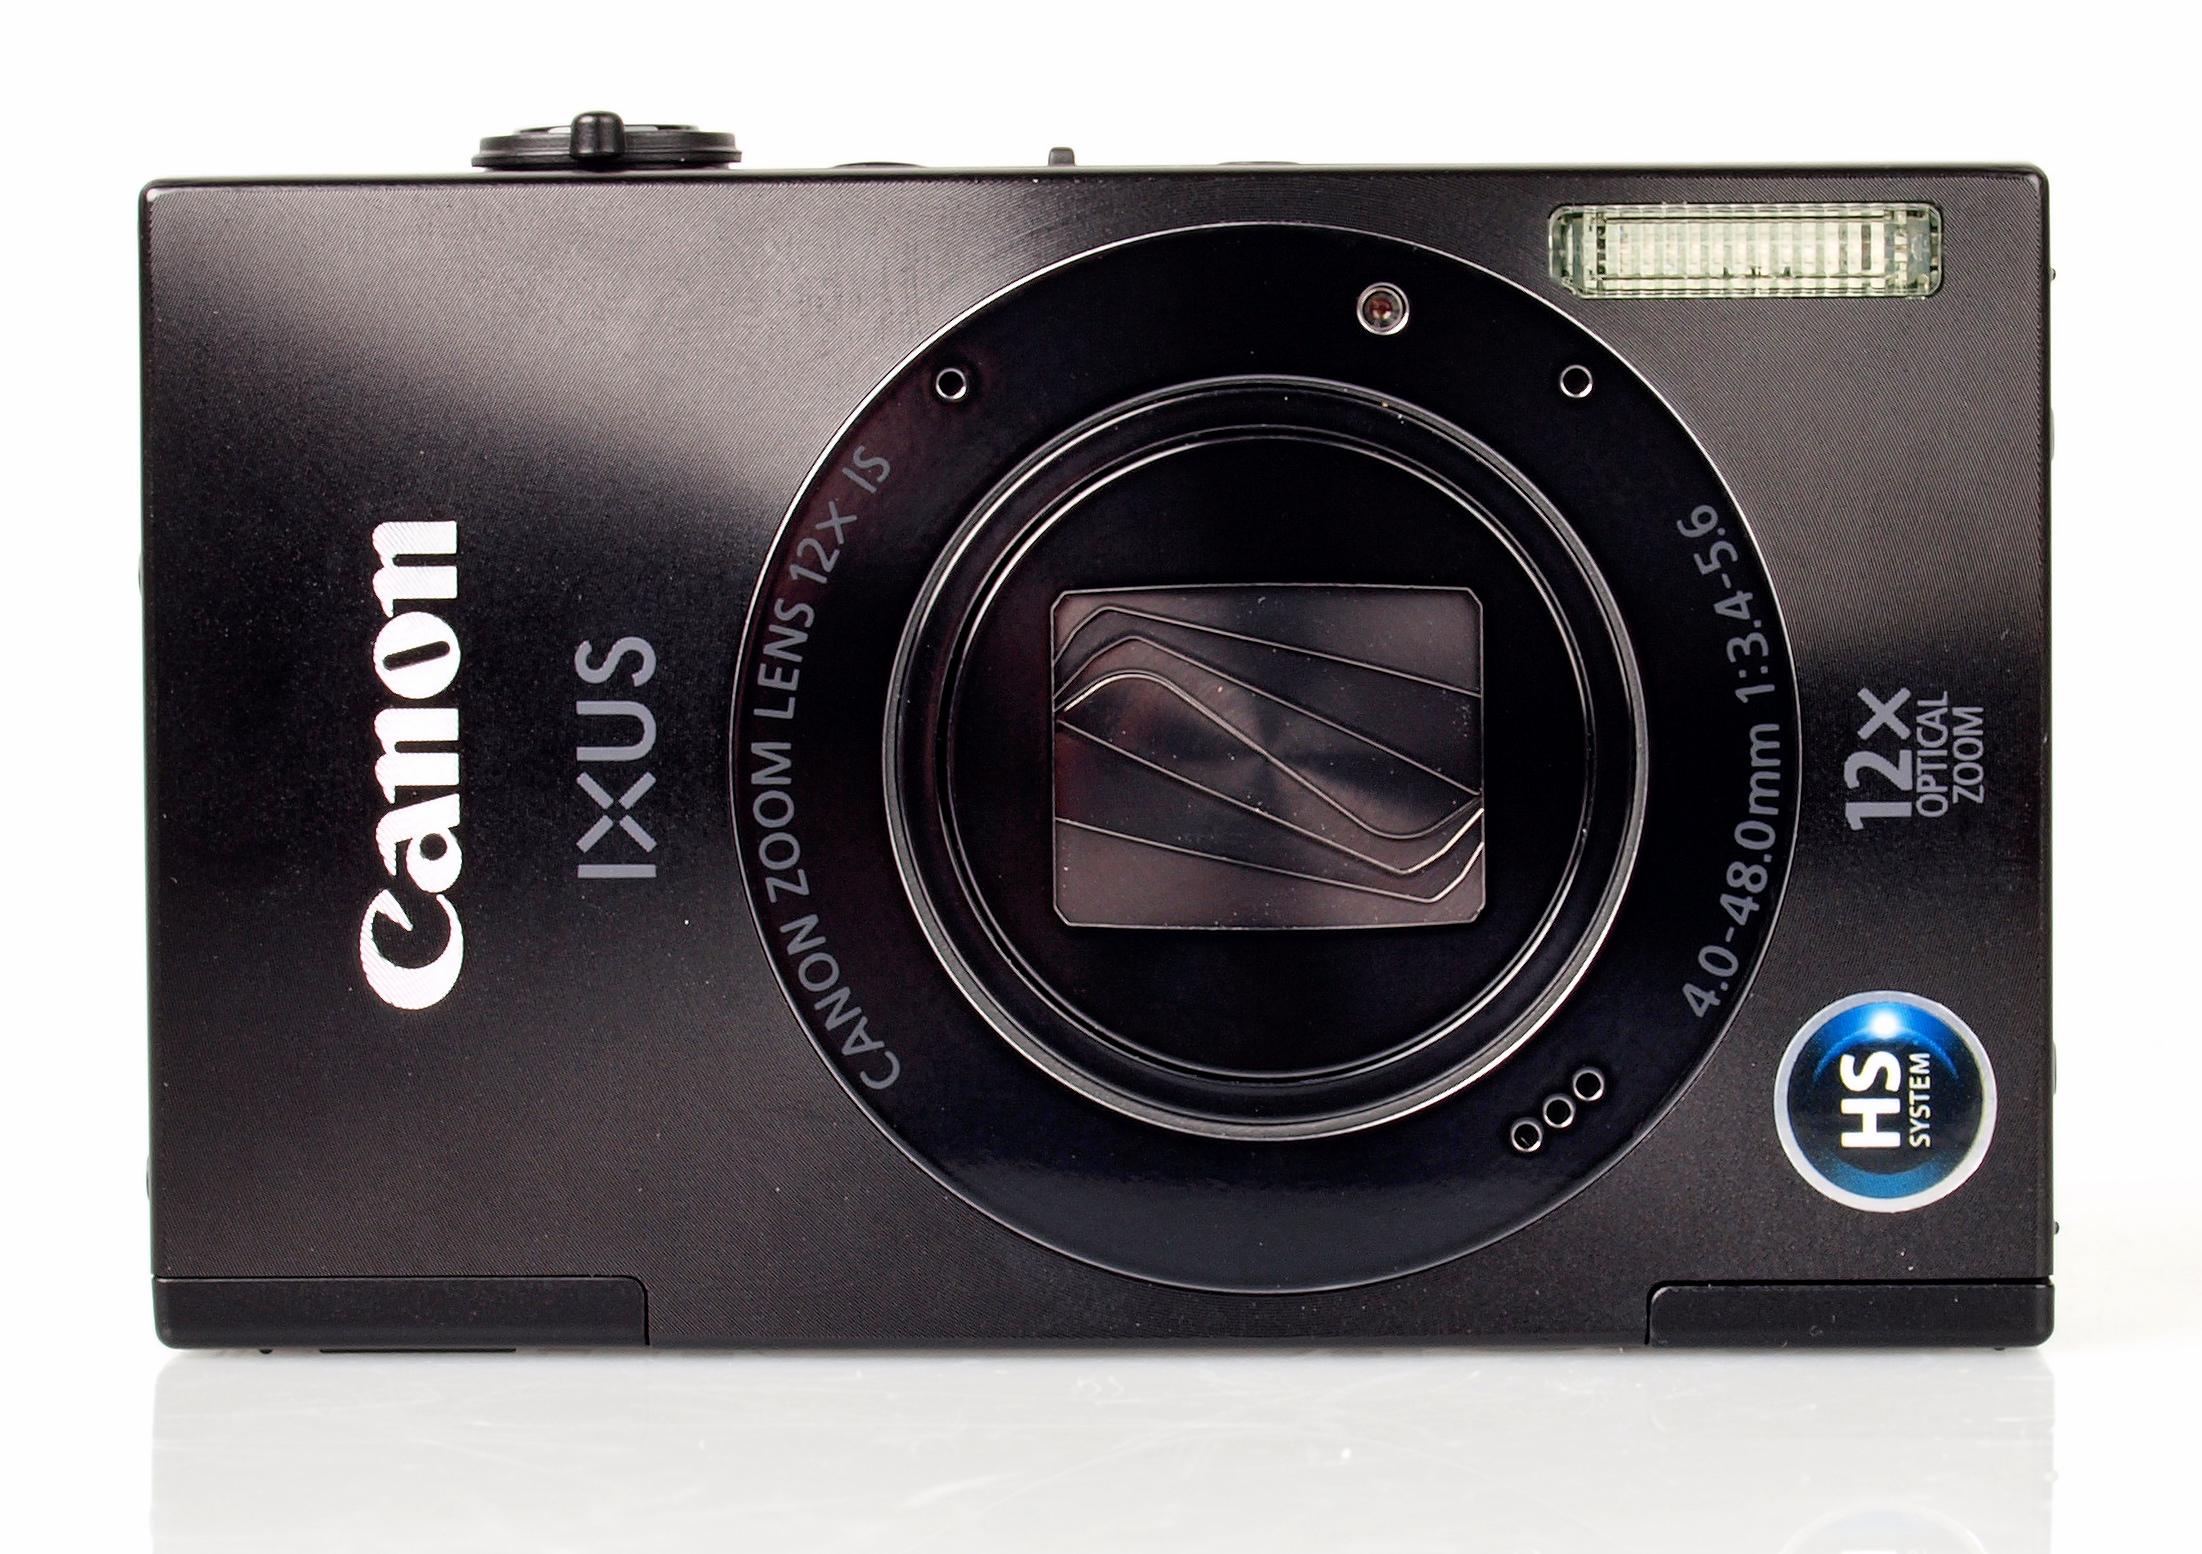 canon ixus 500 hs digital compact camera review rh ephotozine com canon ixus 500 manual pdf canon digital ixus 500 manual